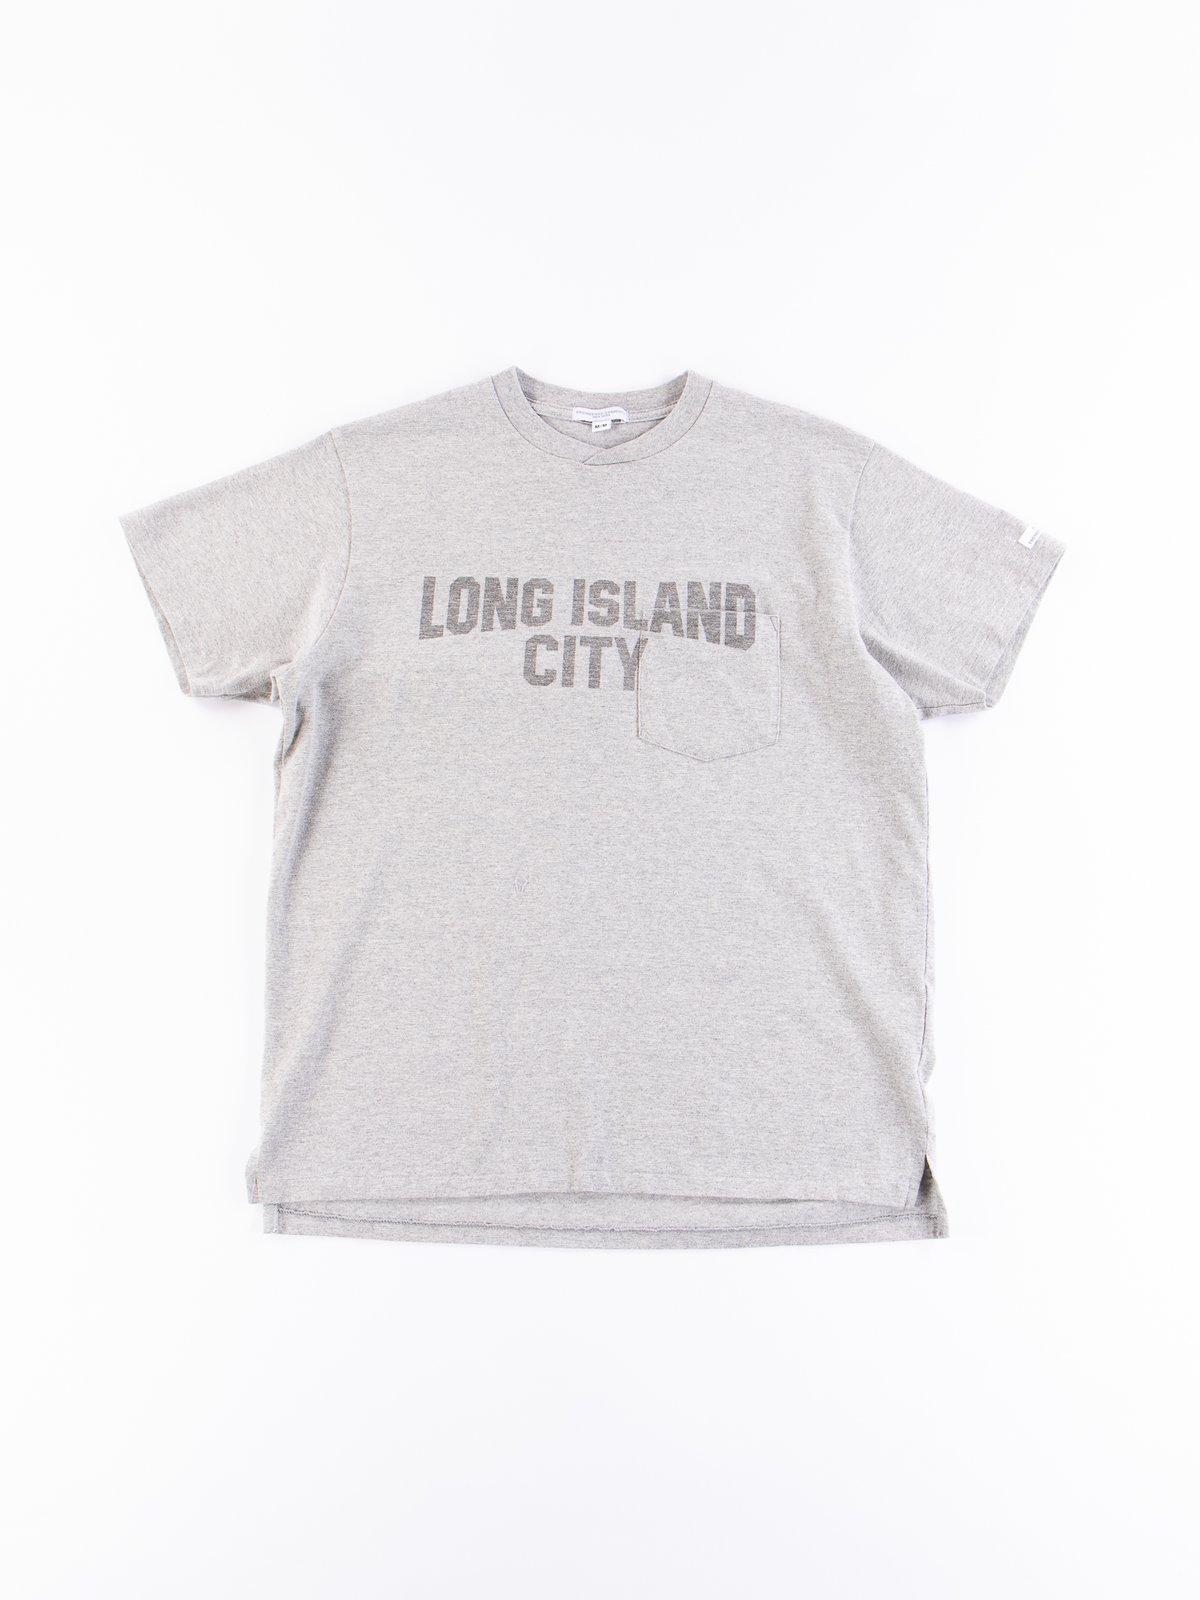 Long Island Bureau.Grey Long Island City Printed T Shirt By Engineered Garments The